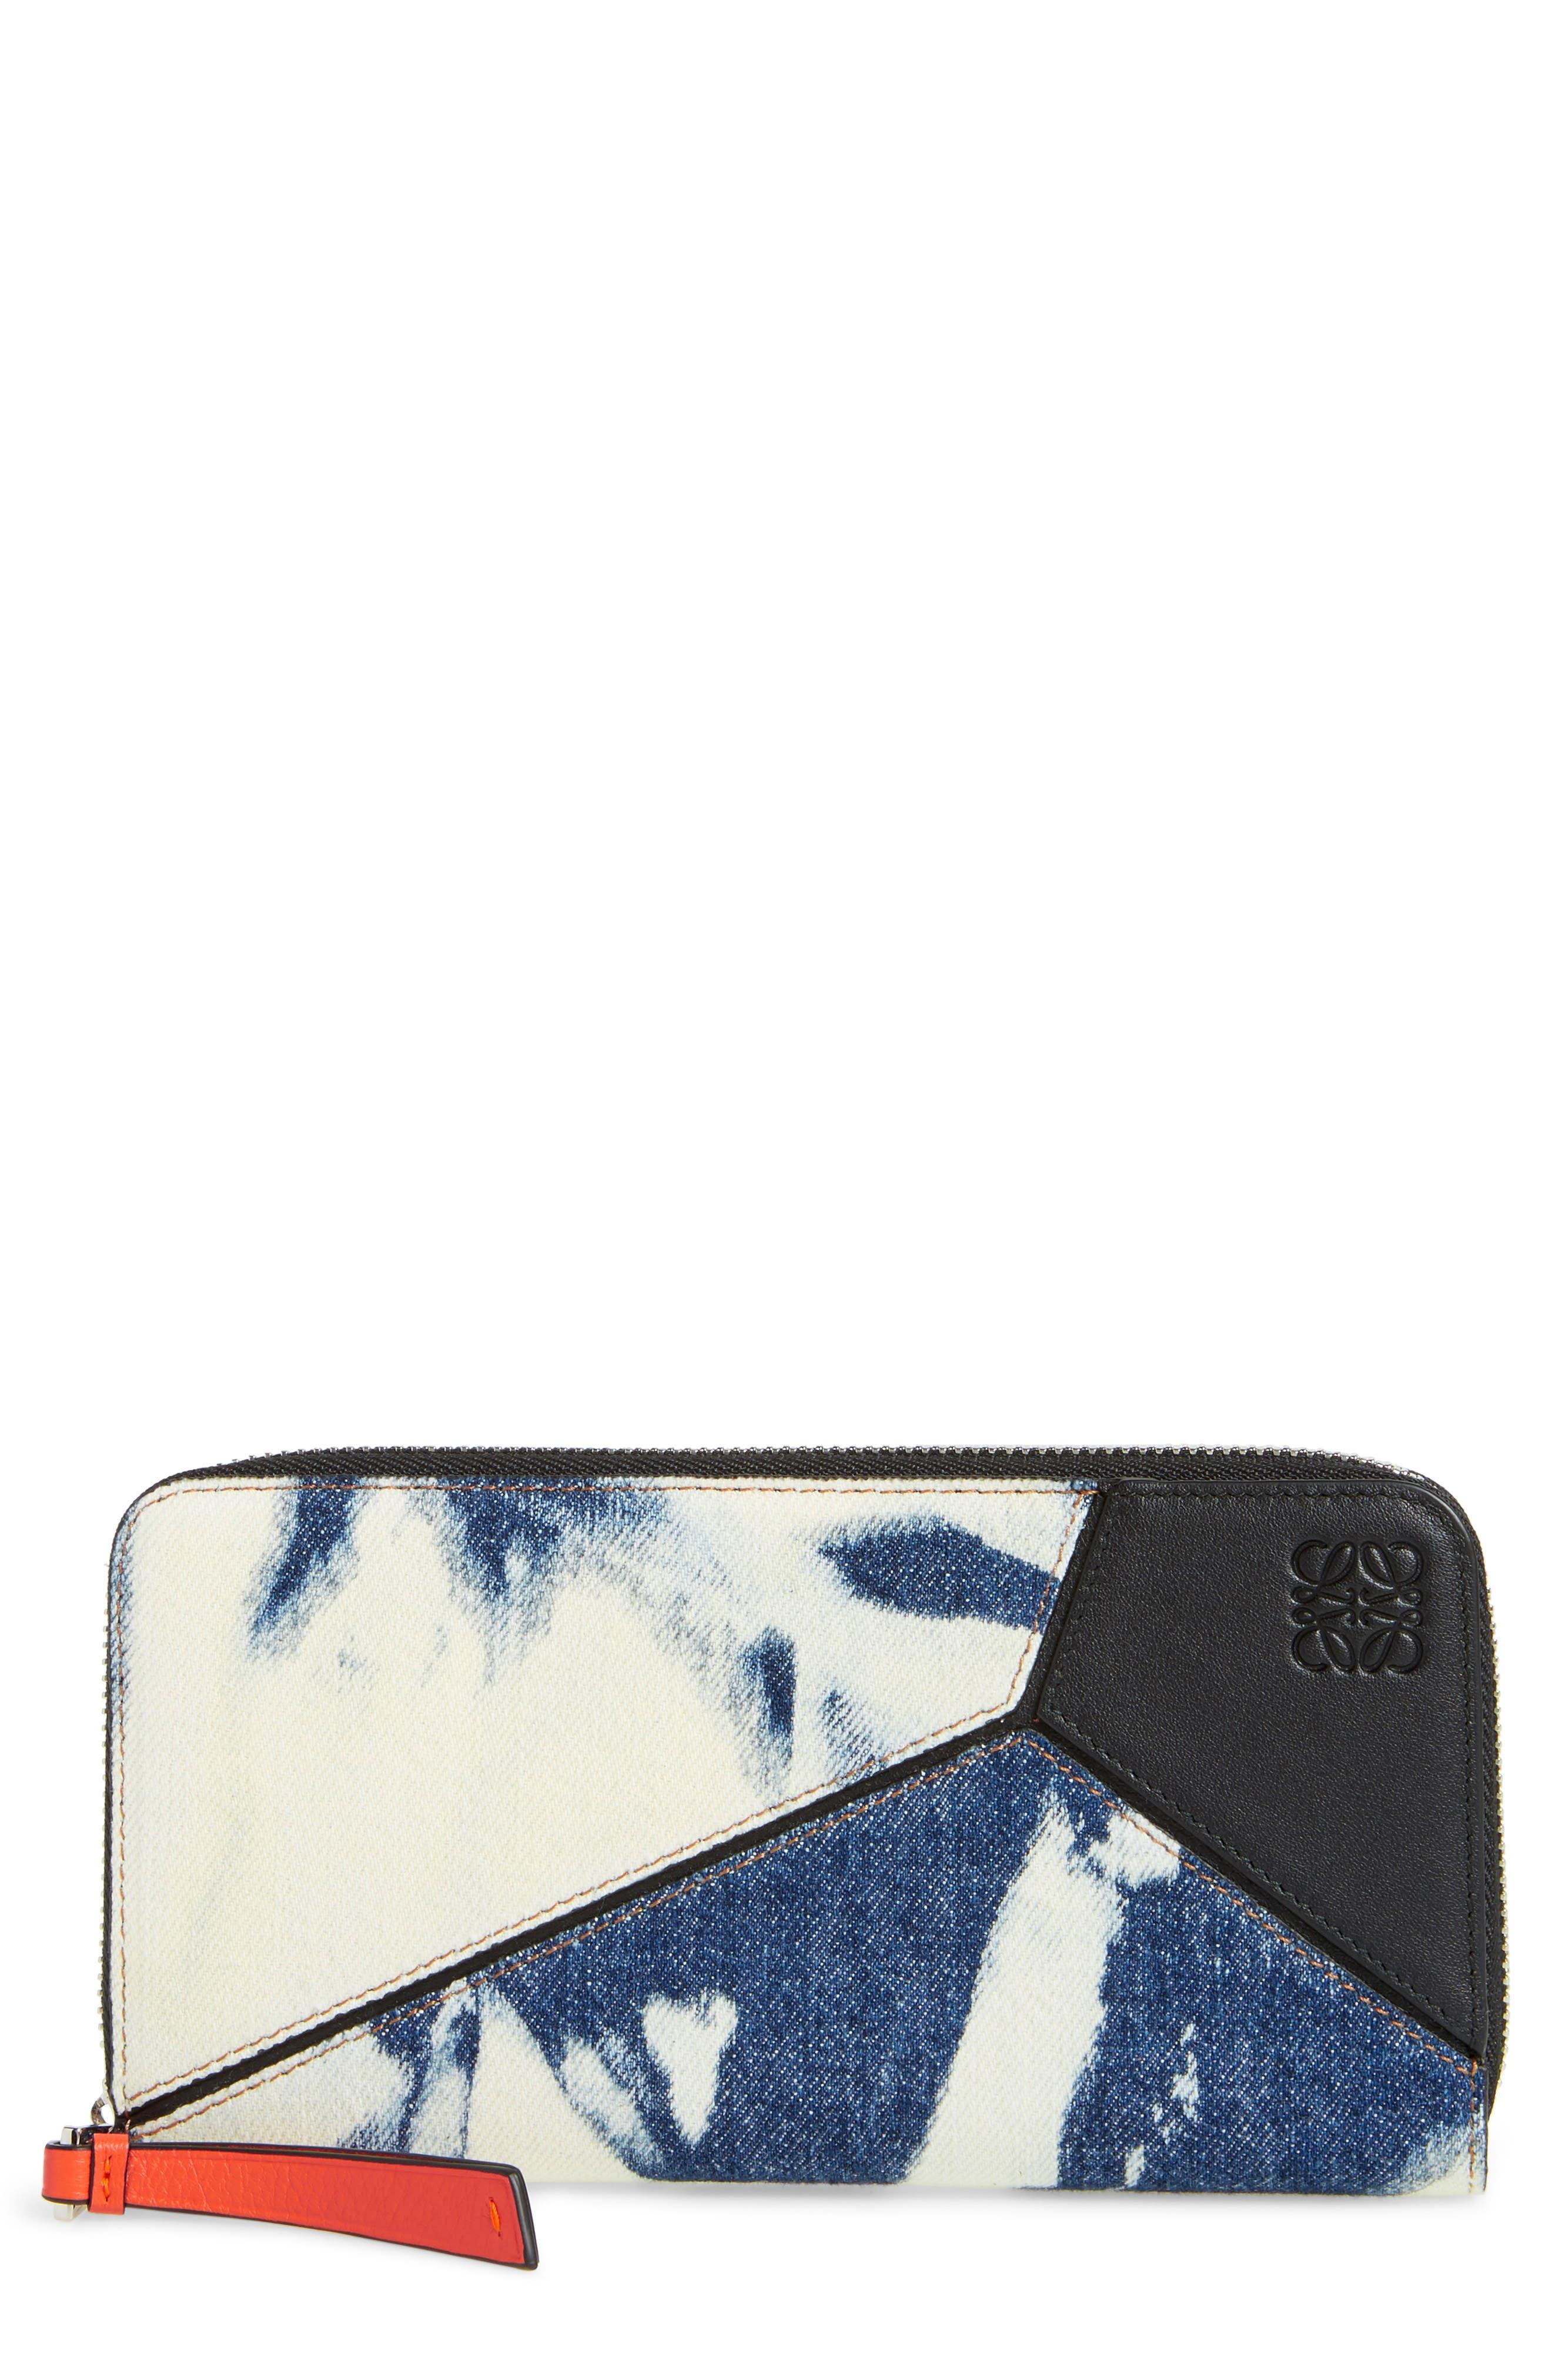 Main Image - Loewe Denim Puzzle Zip Around Leather Wallet